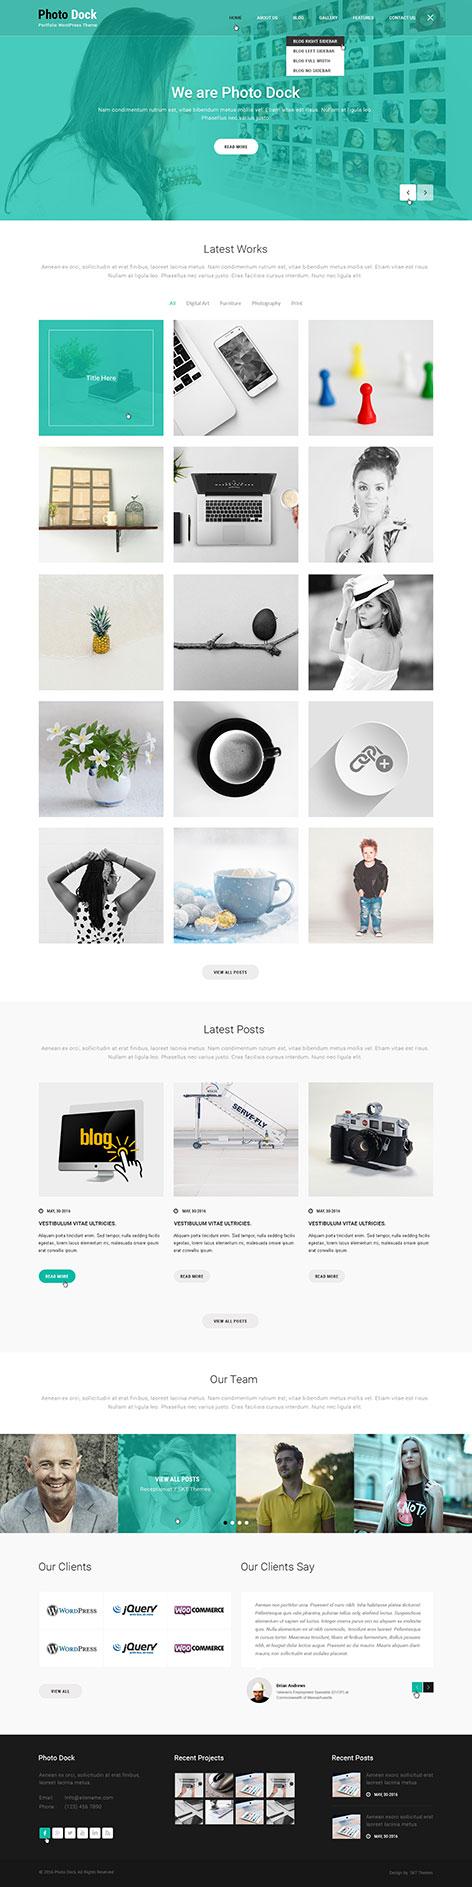 portfolio wordpress theme1 - Photodock